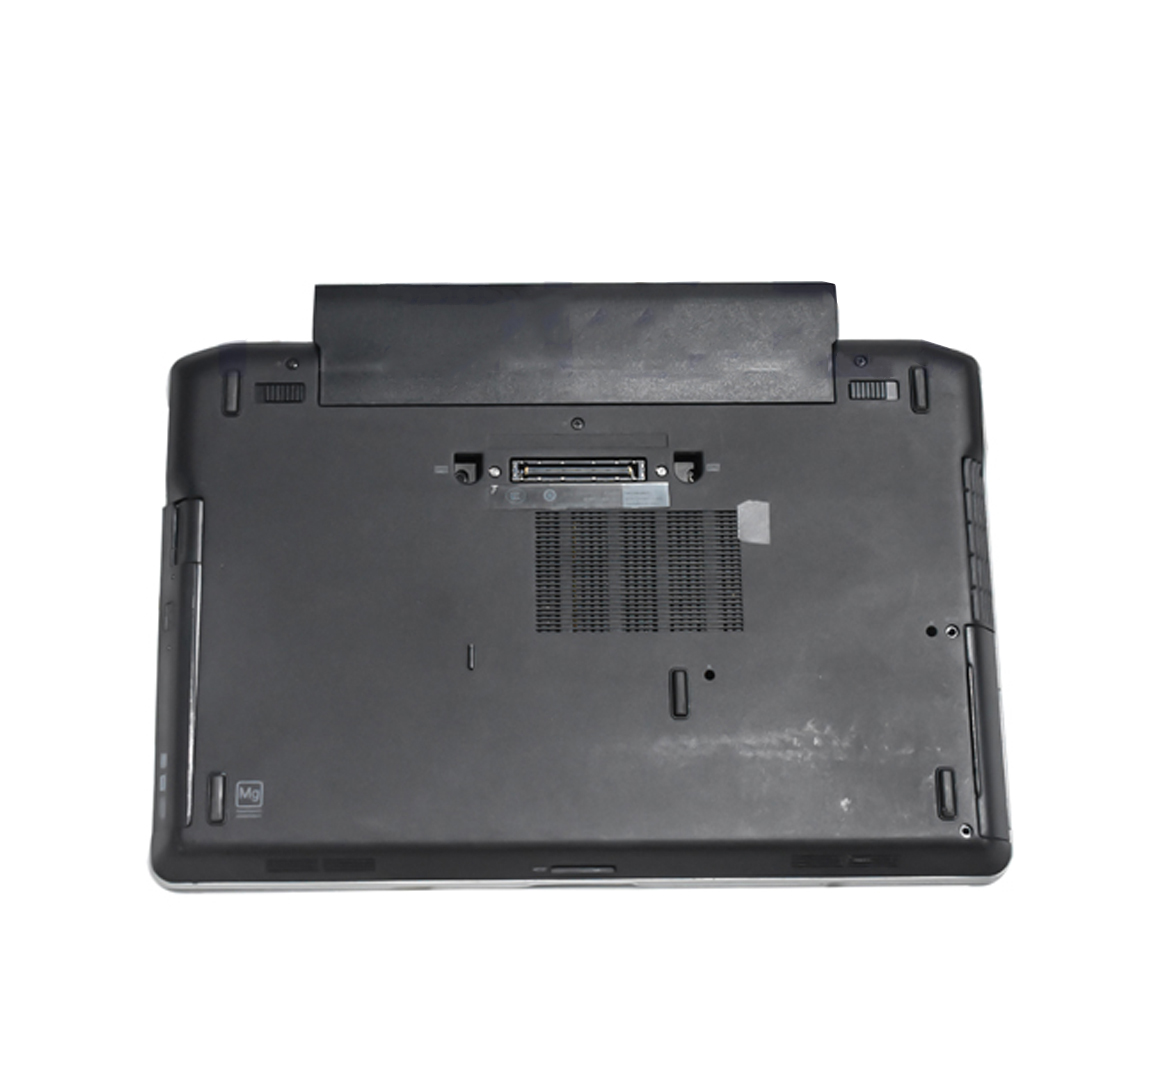 Dell Latitude E6330 Business Laptop, Intel Core i7 33540M CPU, 8GB DDR3 SODIMM RAM, 256GB SSD 2.5, 13 inch Display (Refurbished)